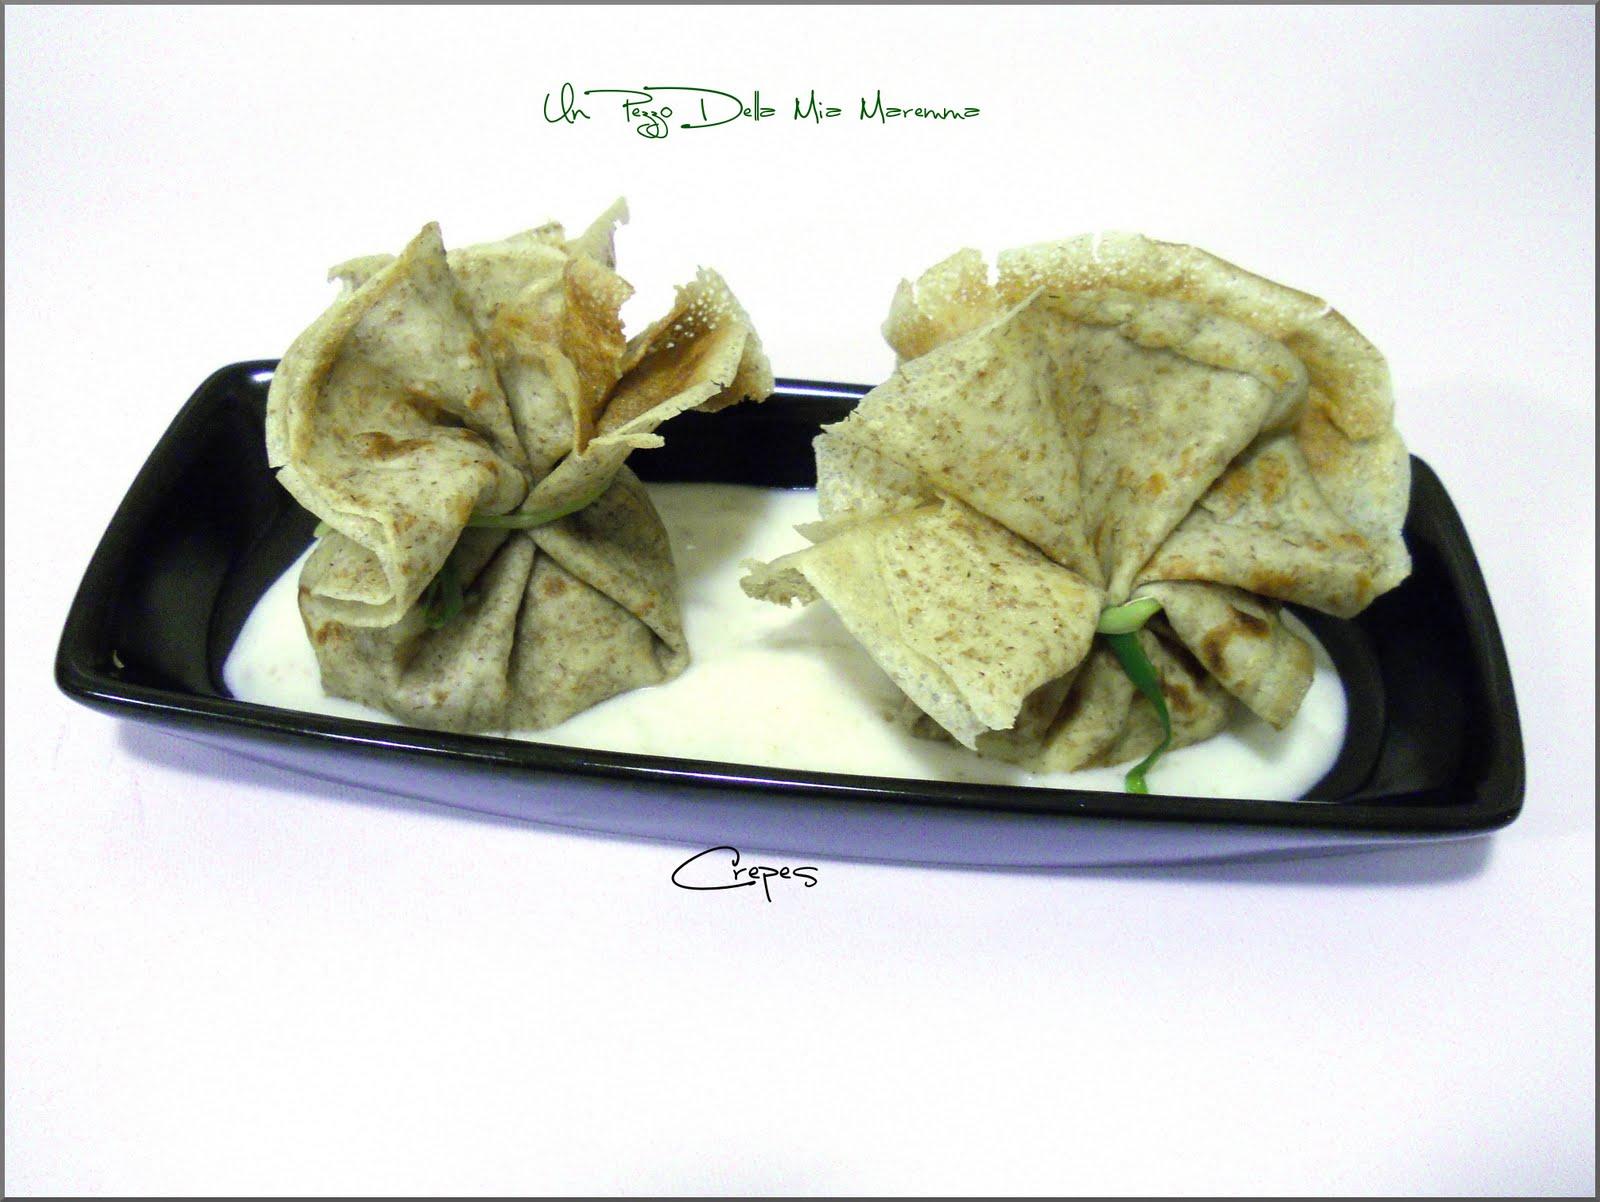 Ricetta crepes 6 pezzi